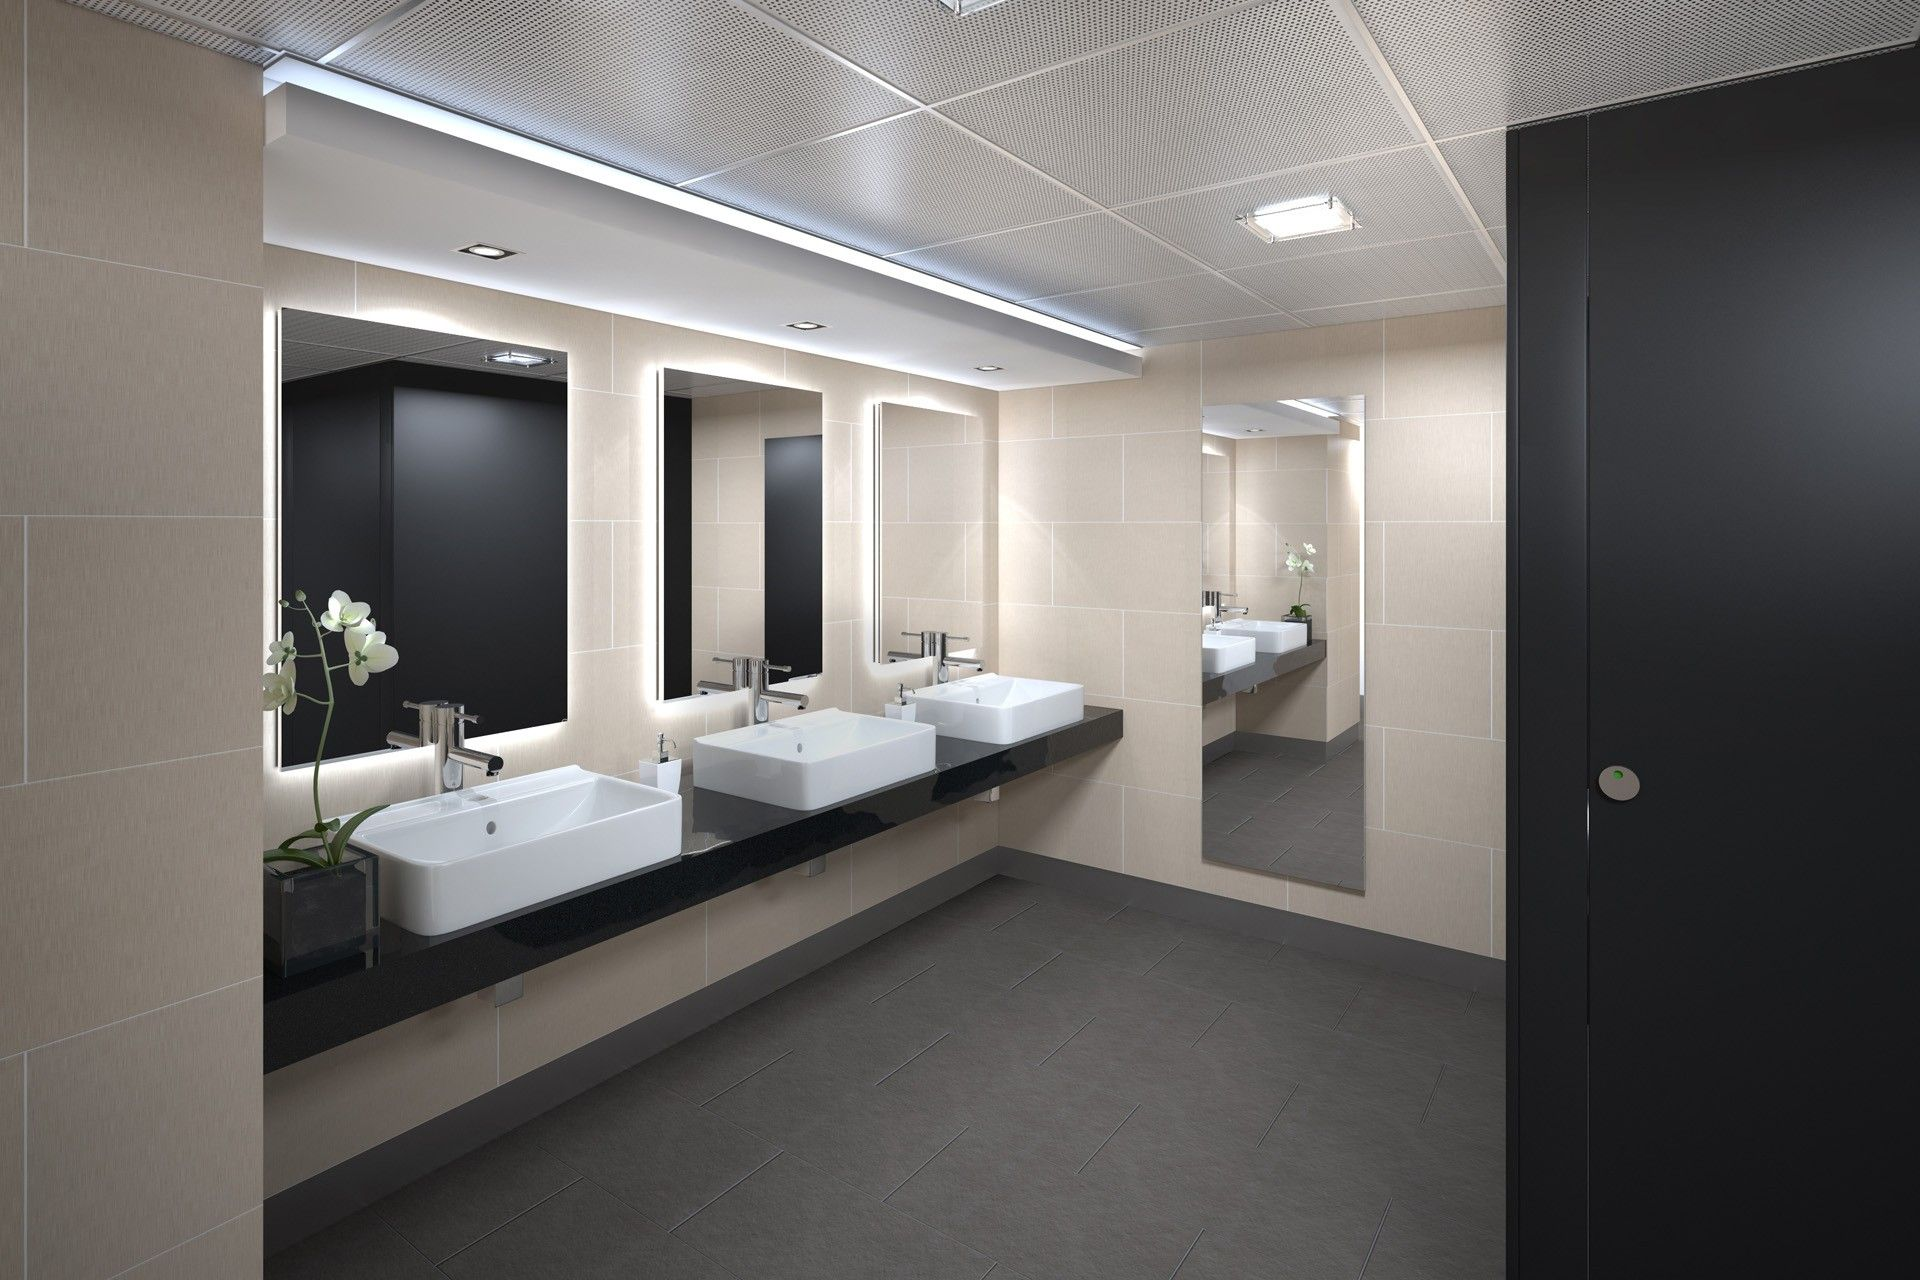 Small Bathroom Commercial Interior Design Google Search Commercial Bathroom Designs Washroom Design Commercial Bathroom Ideas